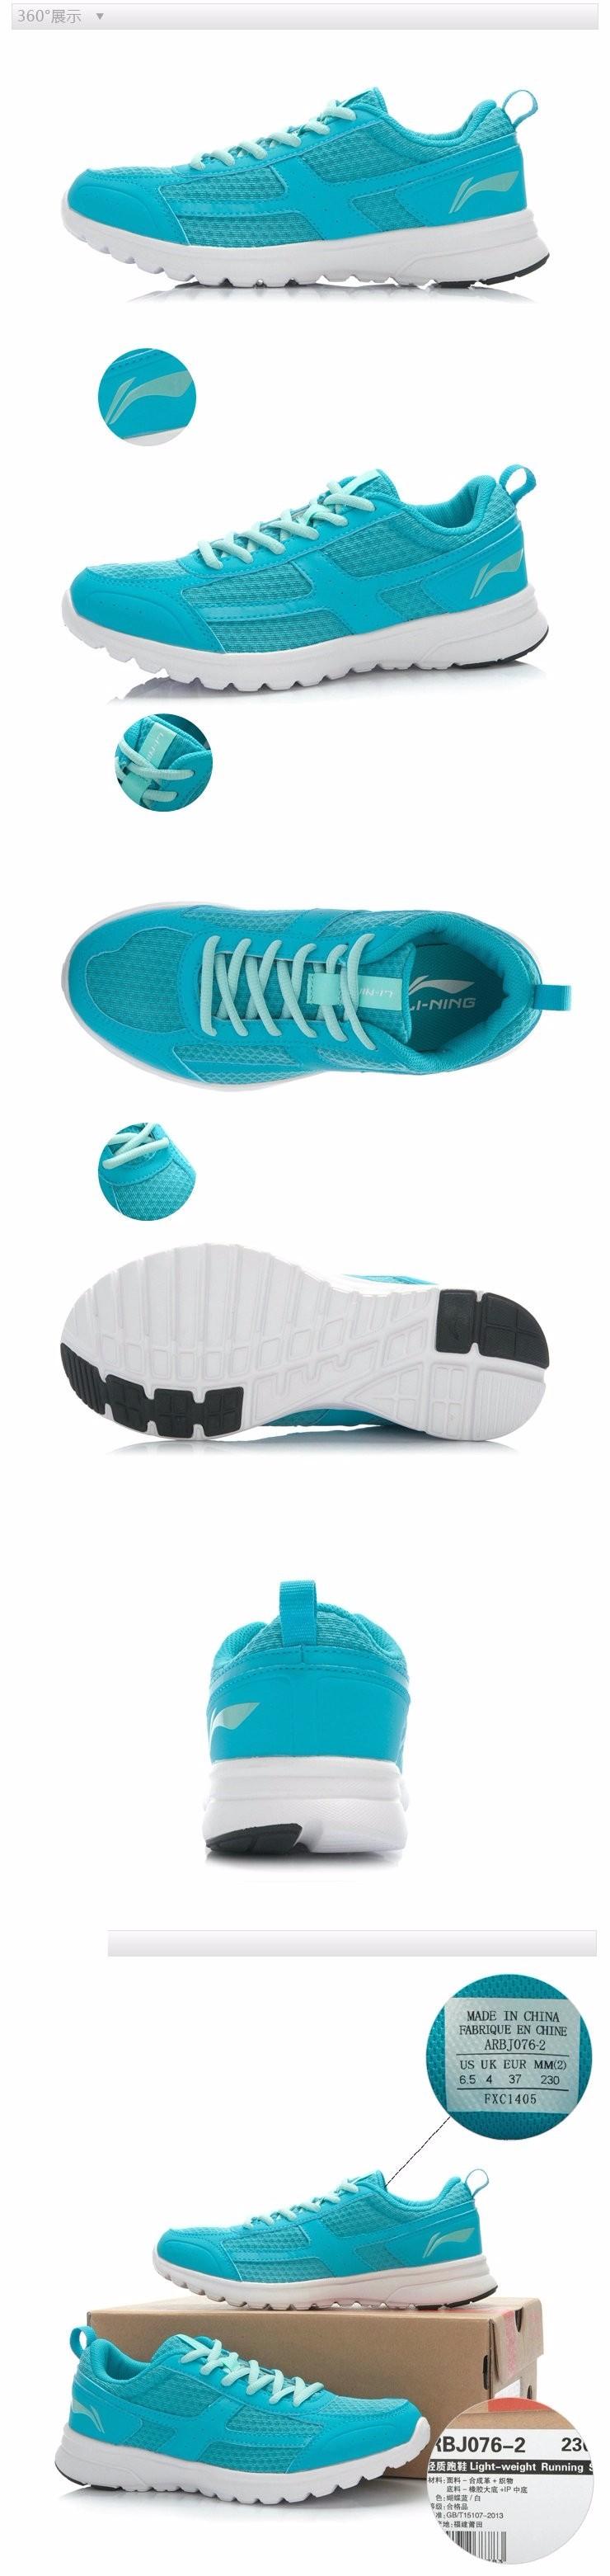 Li-Ning original women running shoes Li Ning Arch Sneakers portabl for women Breathable mesh sports shoes free shipping ARBJ076